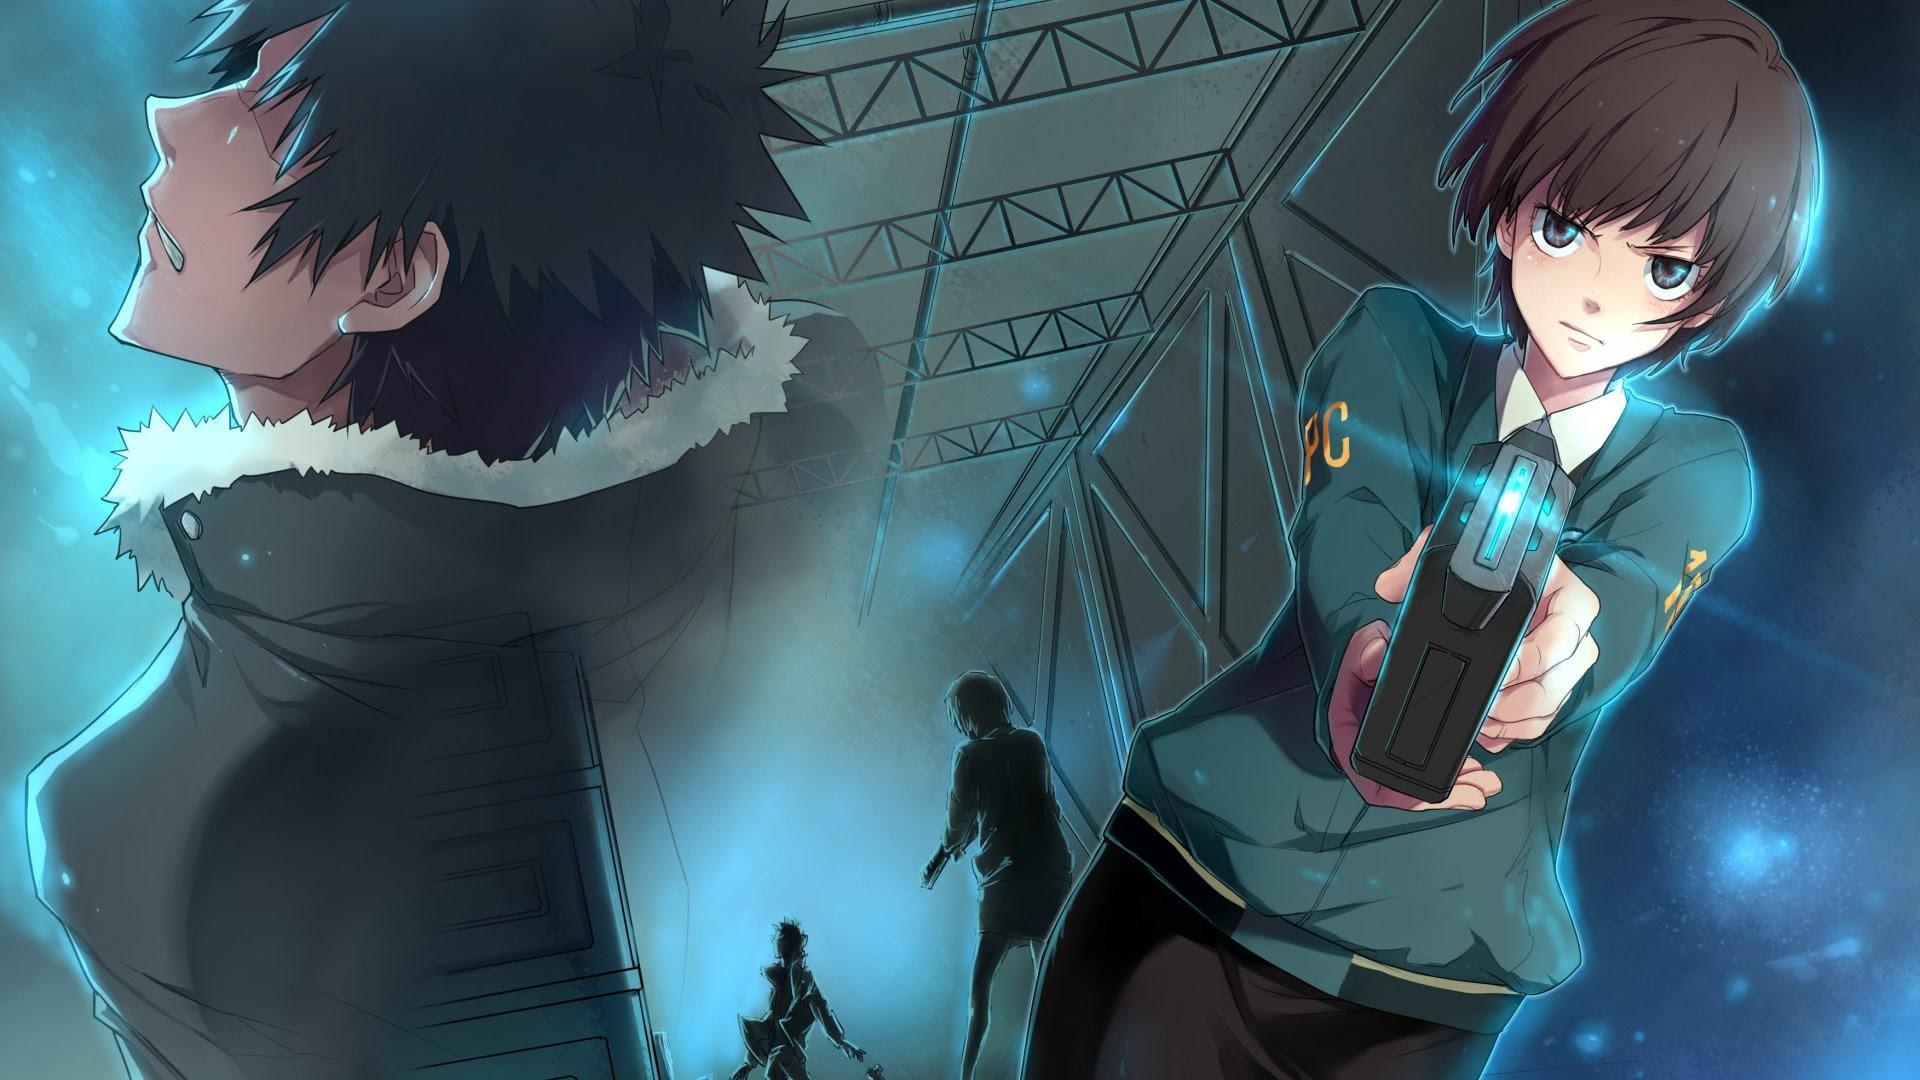 1920x1080 Psycho Pass Shinya Kogami Tsunemori Akane Anime Wallpaper